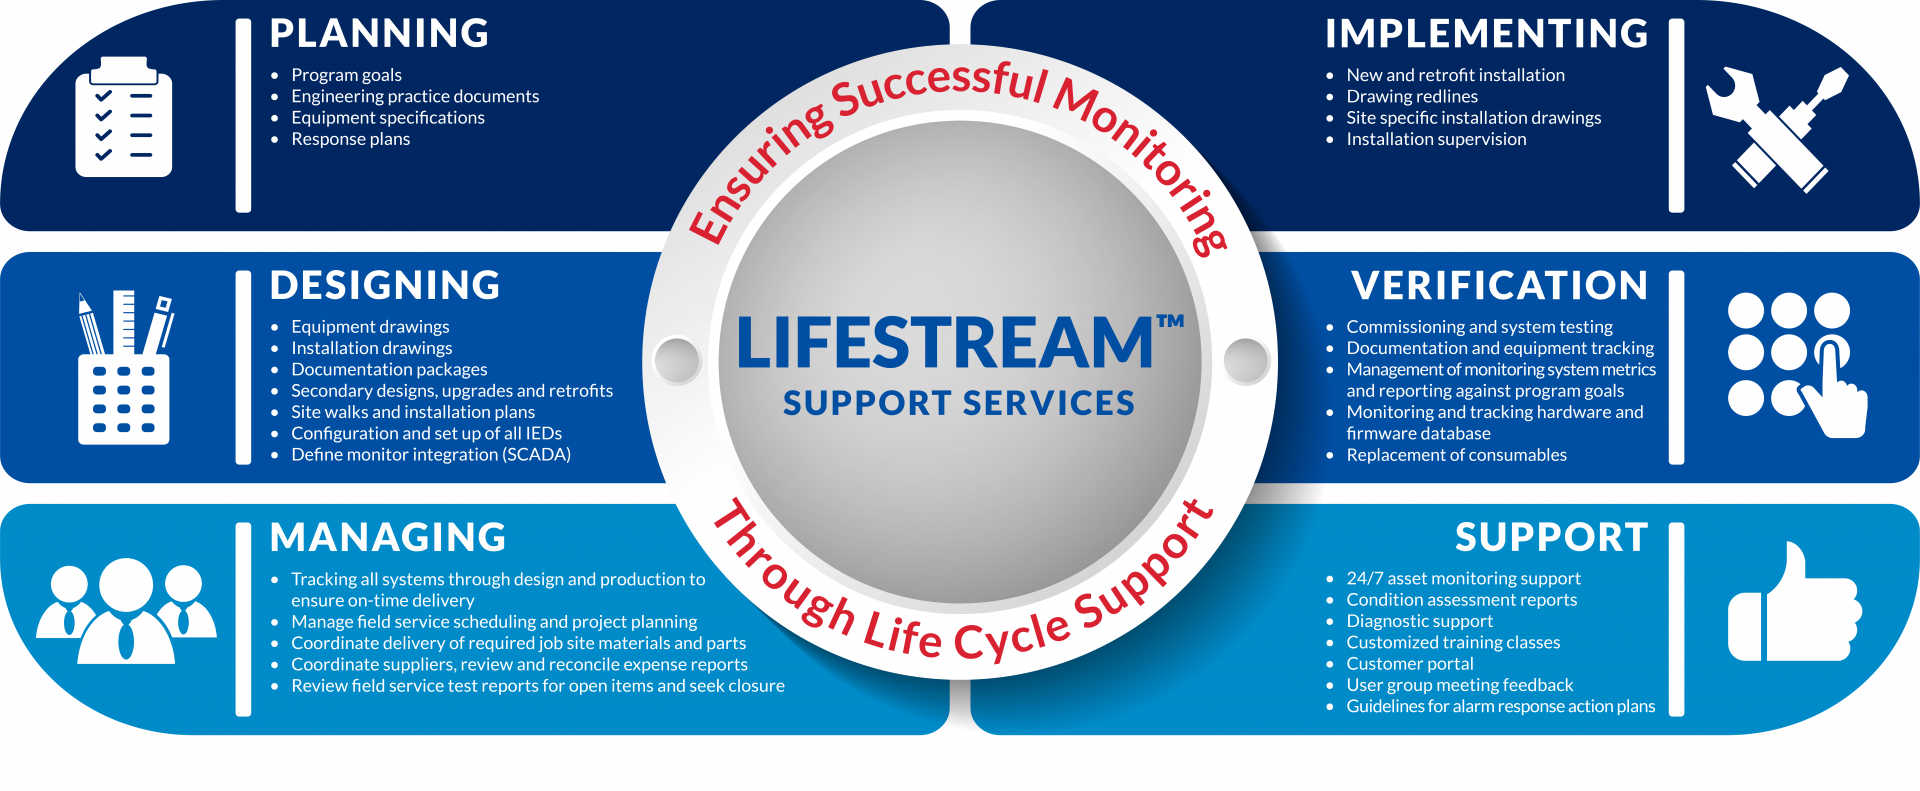 LIFESTREAM Support Services